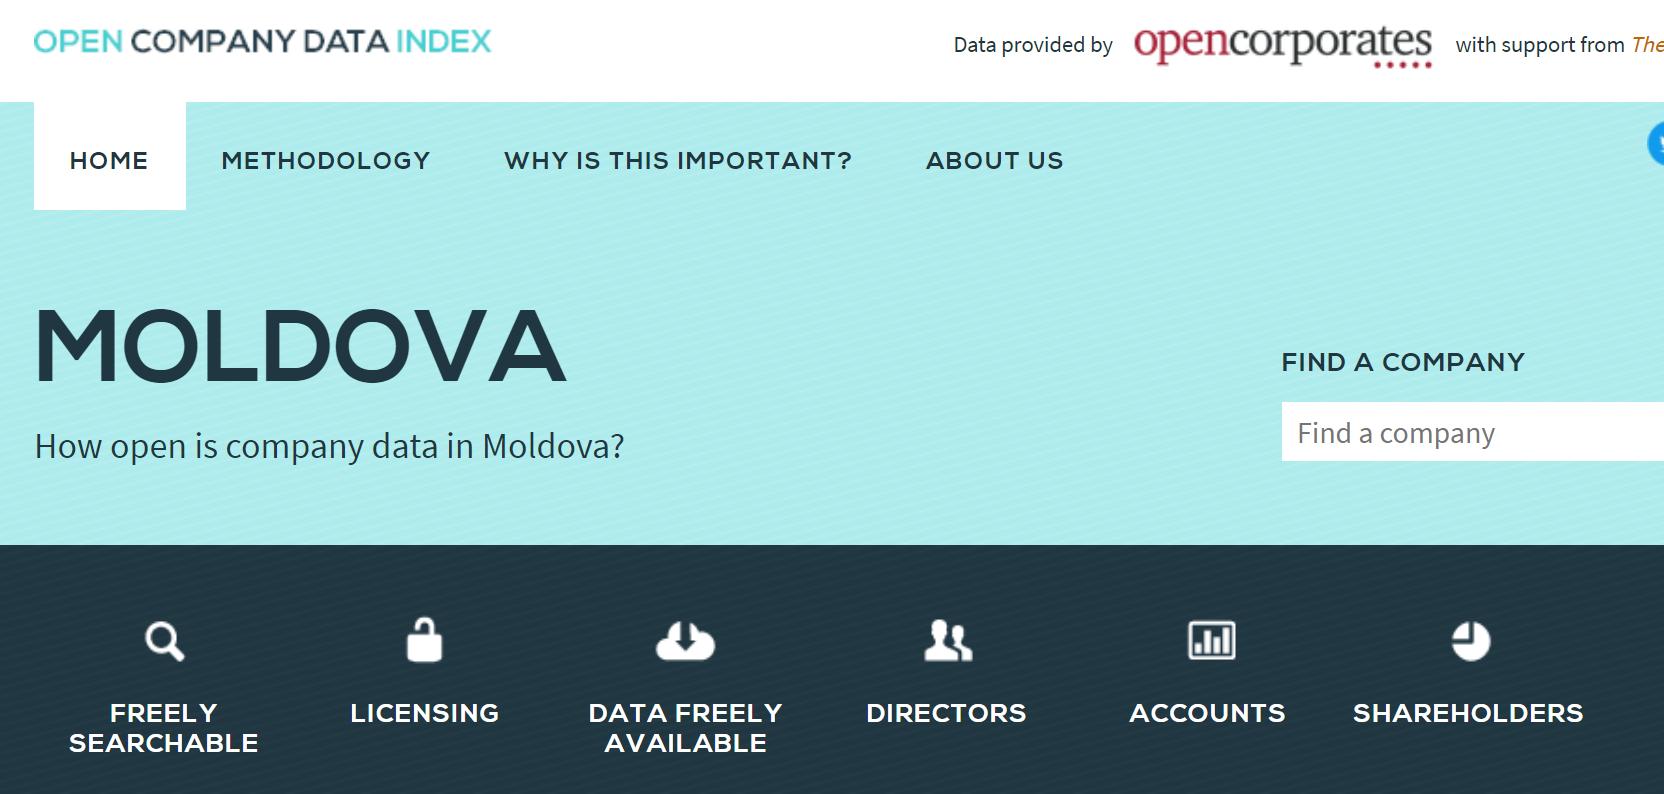 Republica Moldova - lider mondial la deschiderea datelor privind companiile